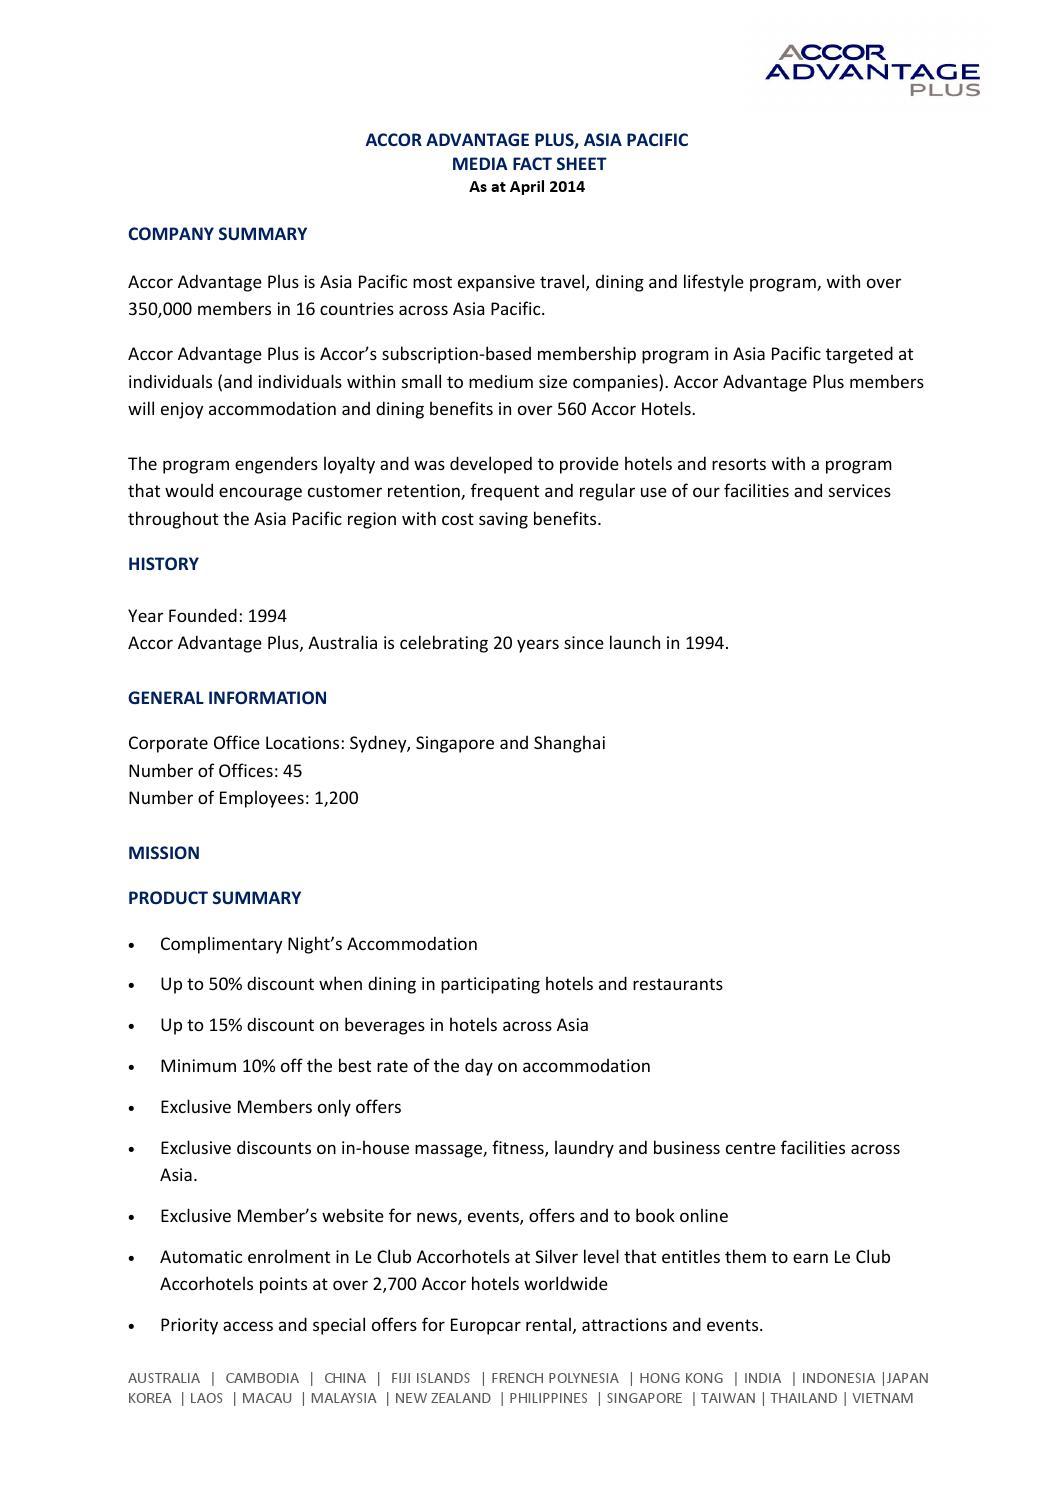 Accor advantage plus media fact sheet by rami tamer issuu - Accor australia head office ...